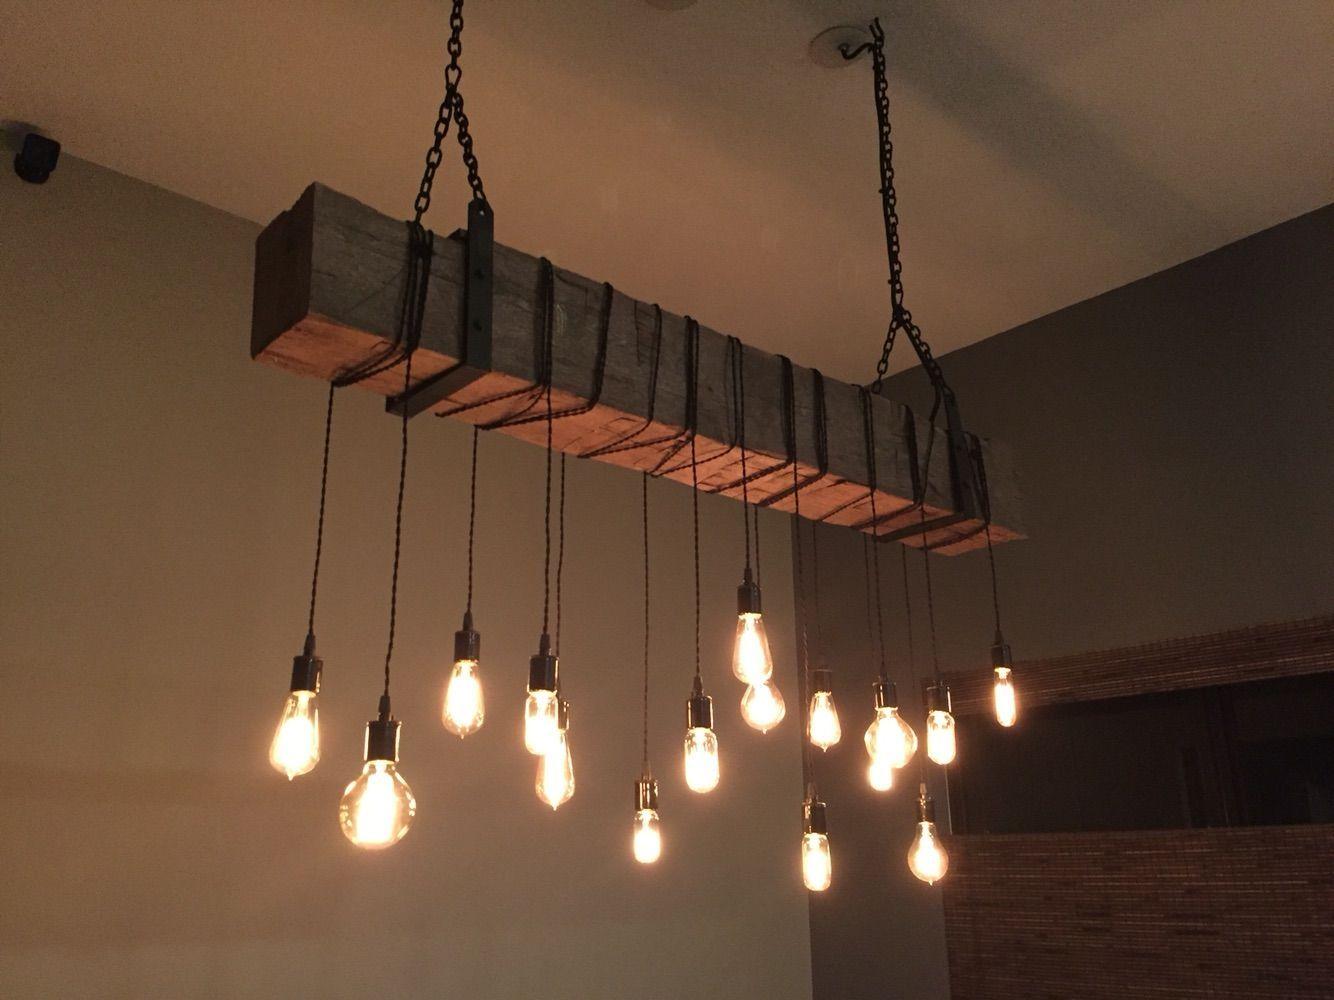 Custom Made Reclaimed Barn Beam Chandelier Light Fixture Modern Industrial Rustic Lighting Rustic Light